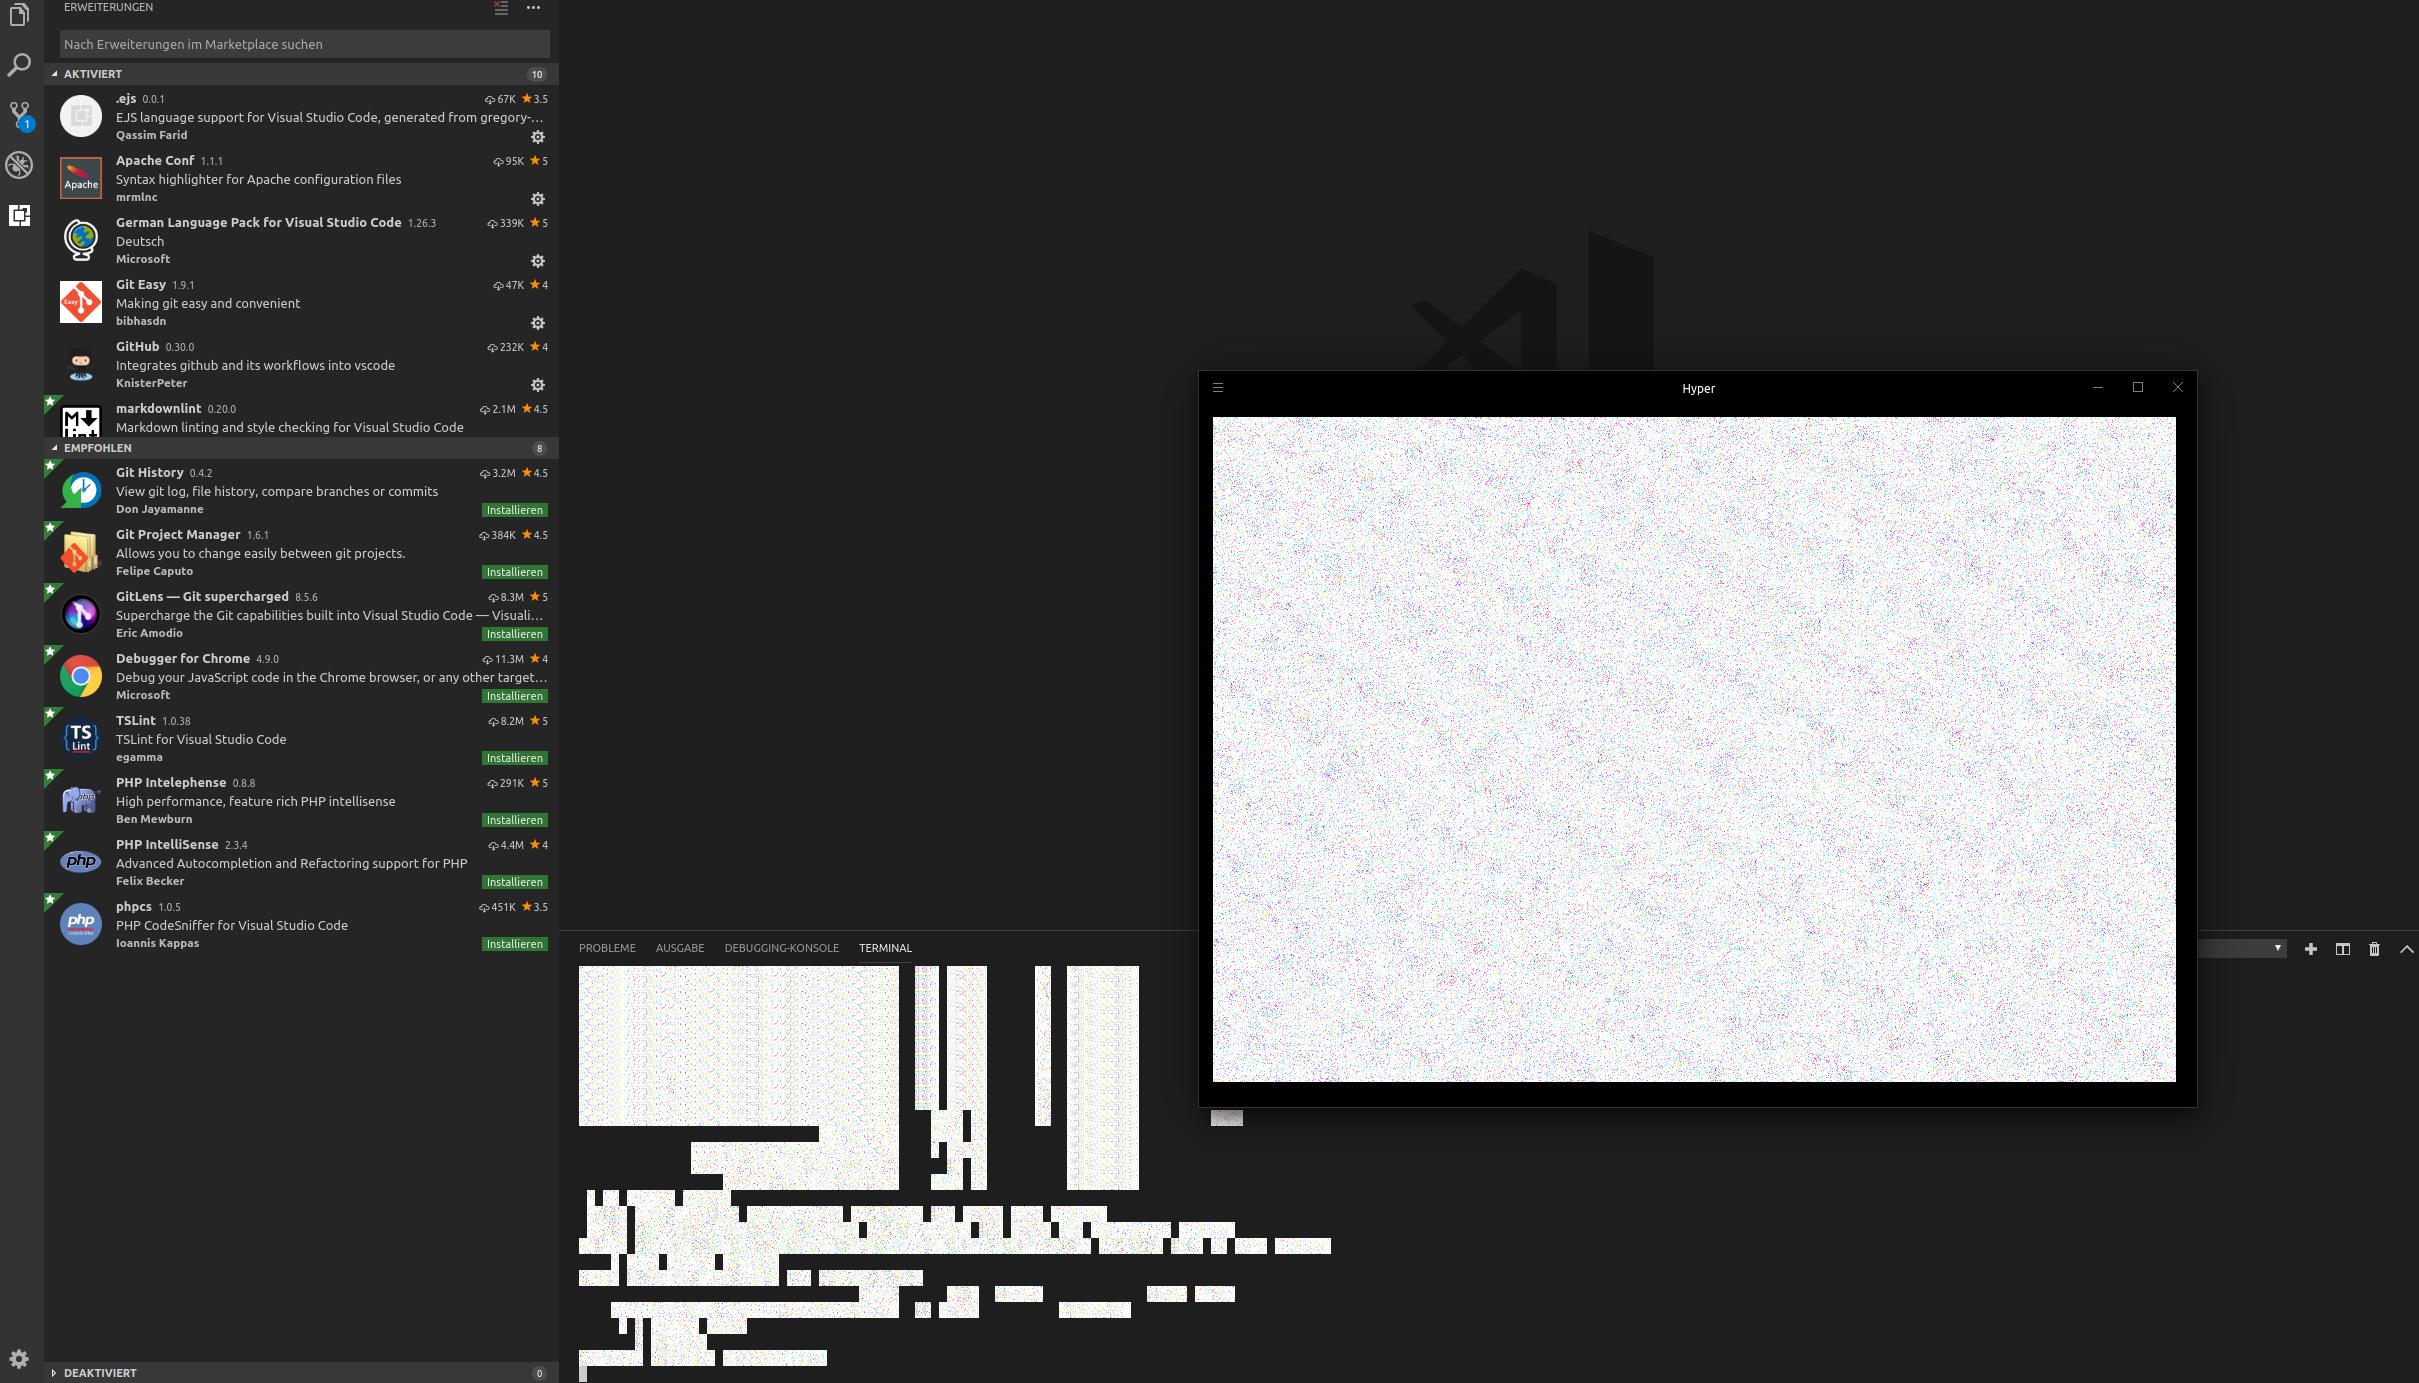 Broken text after system hibernation · Issue #2876 · zeit